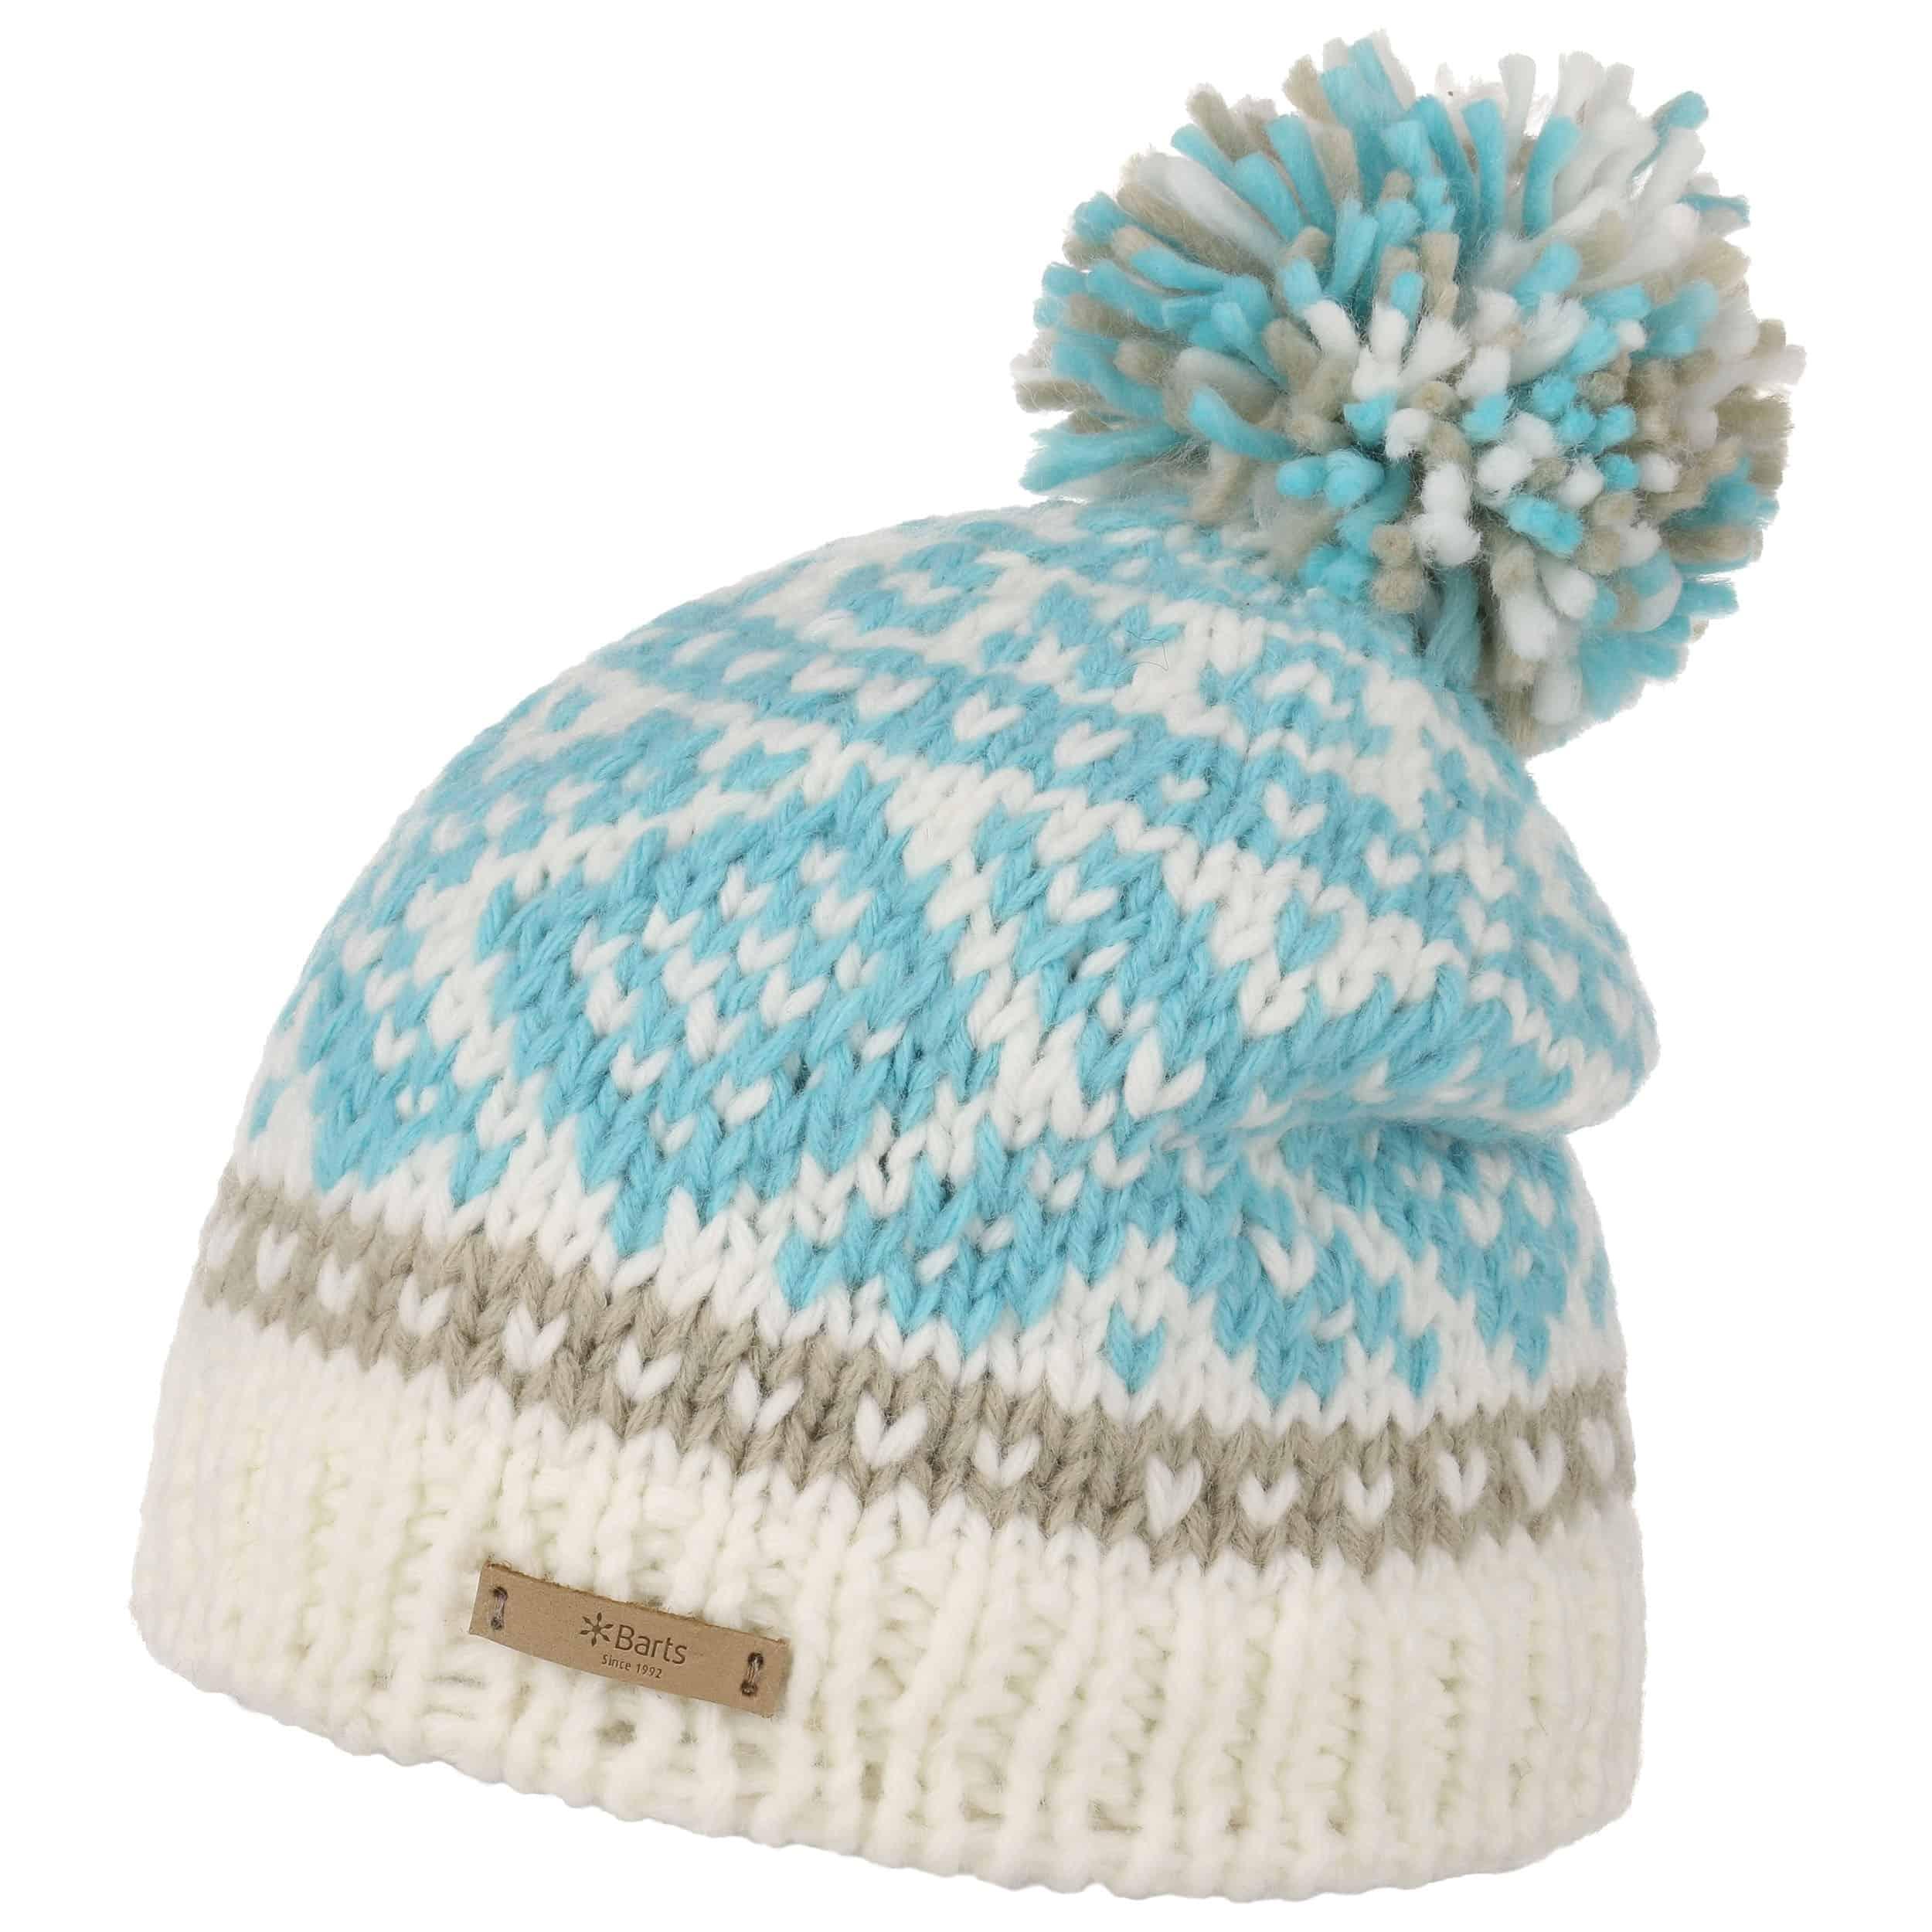 5fe6b88f9f3 ... Log Cabin Pompom Hat by Barts - light blue 1